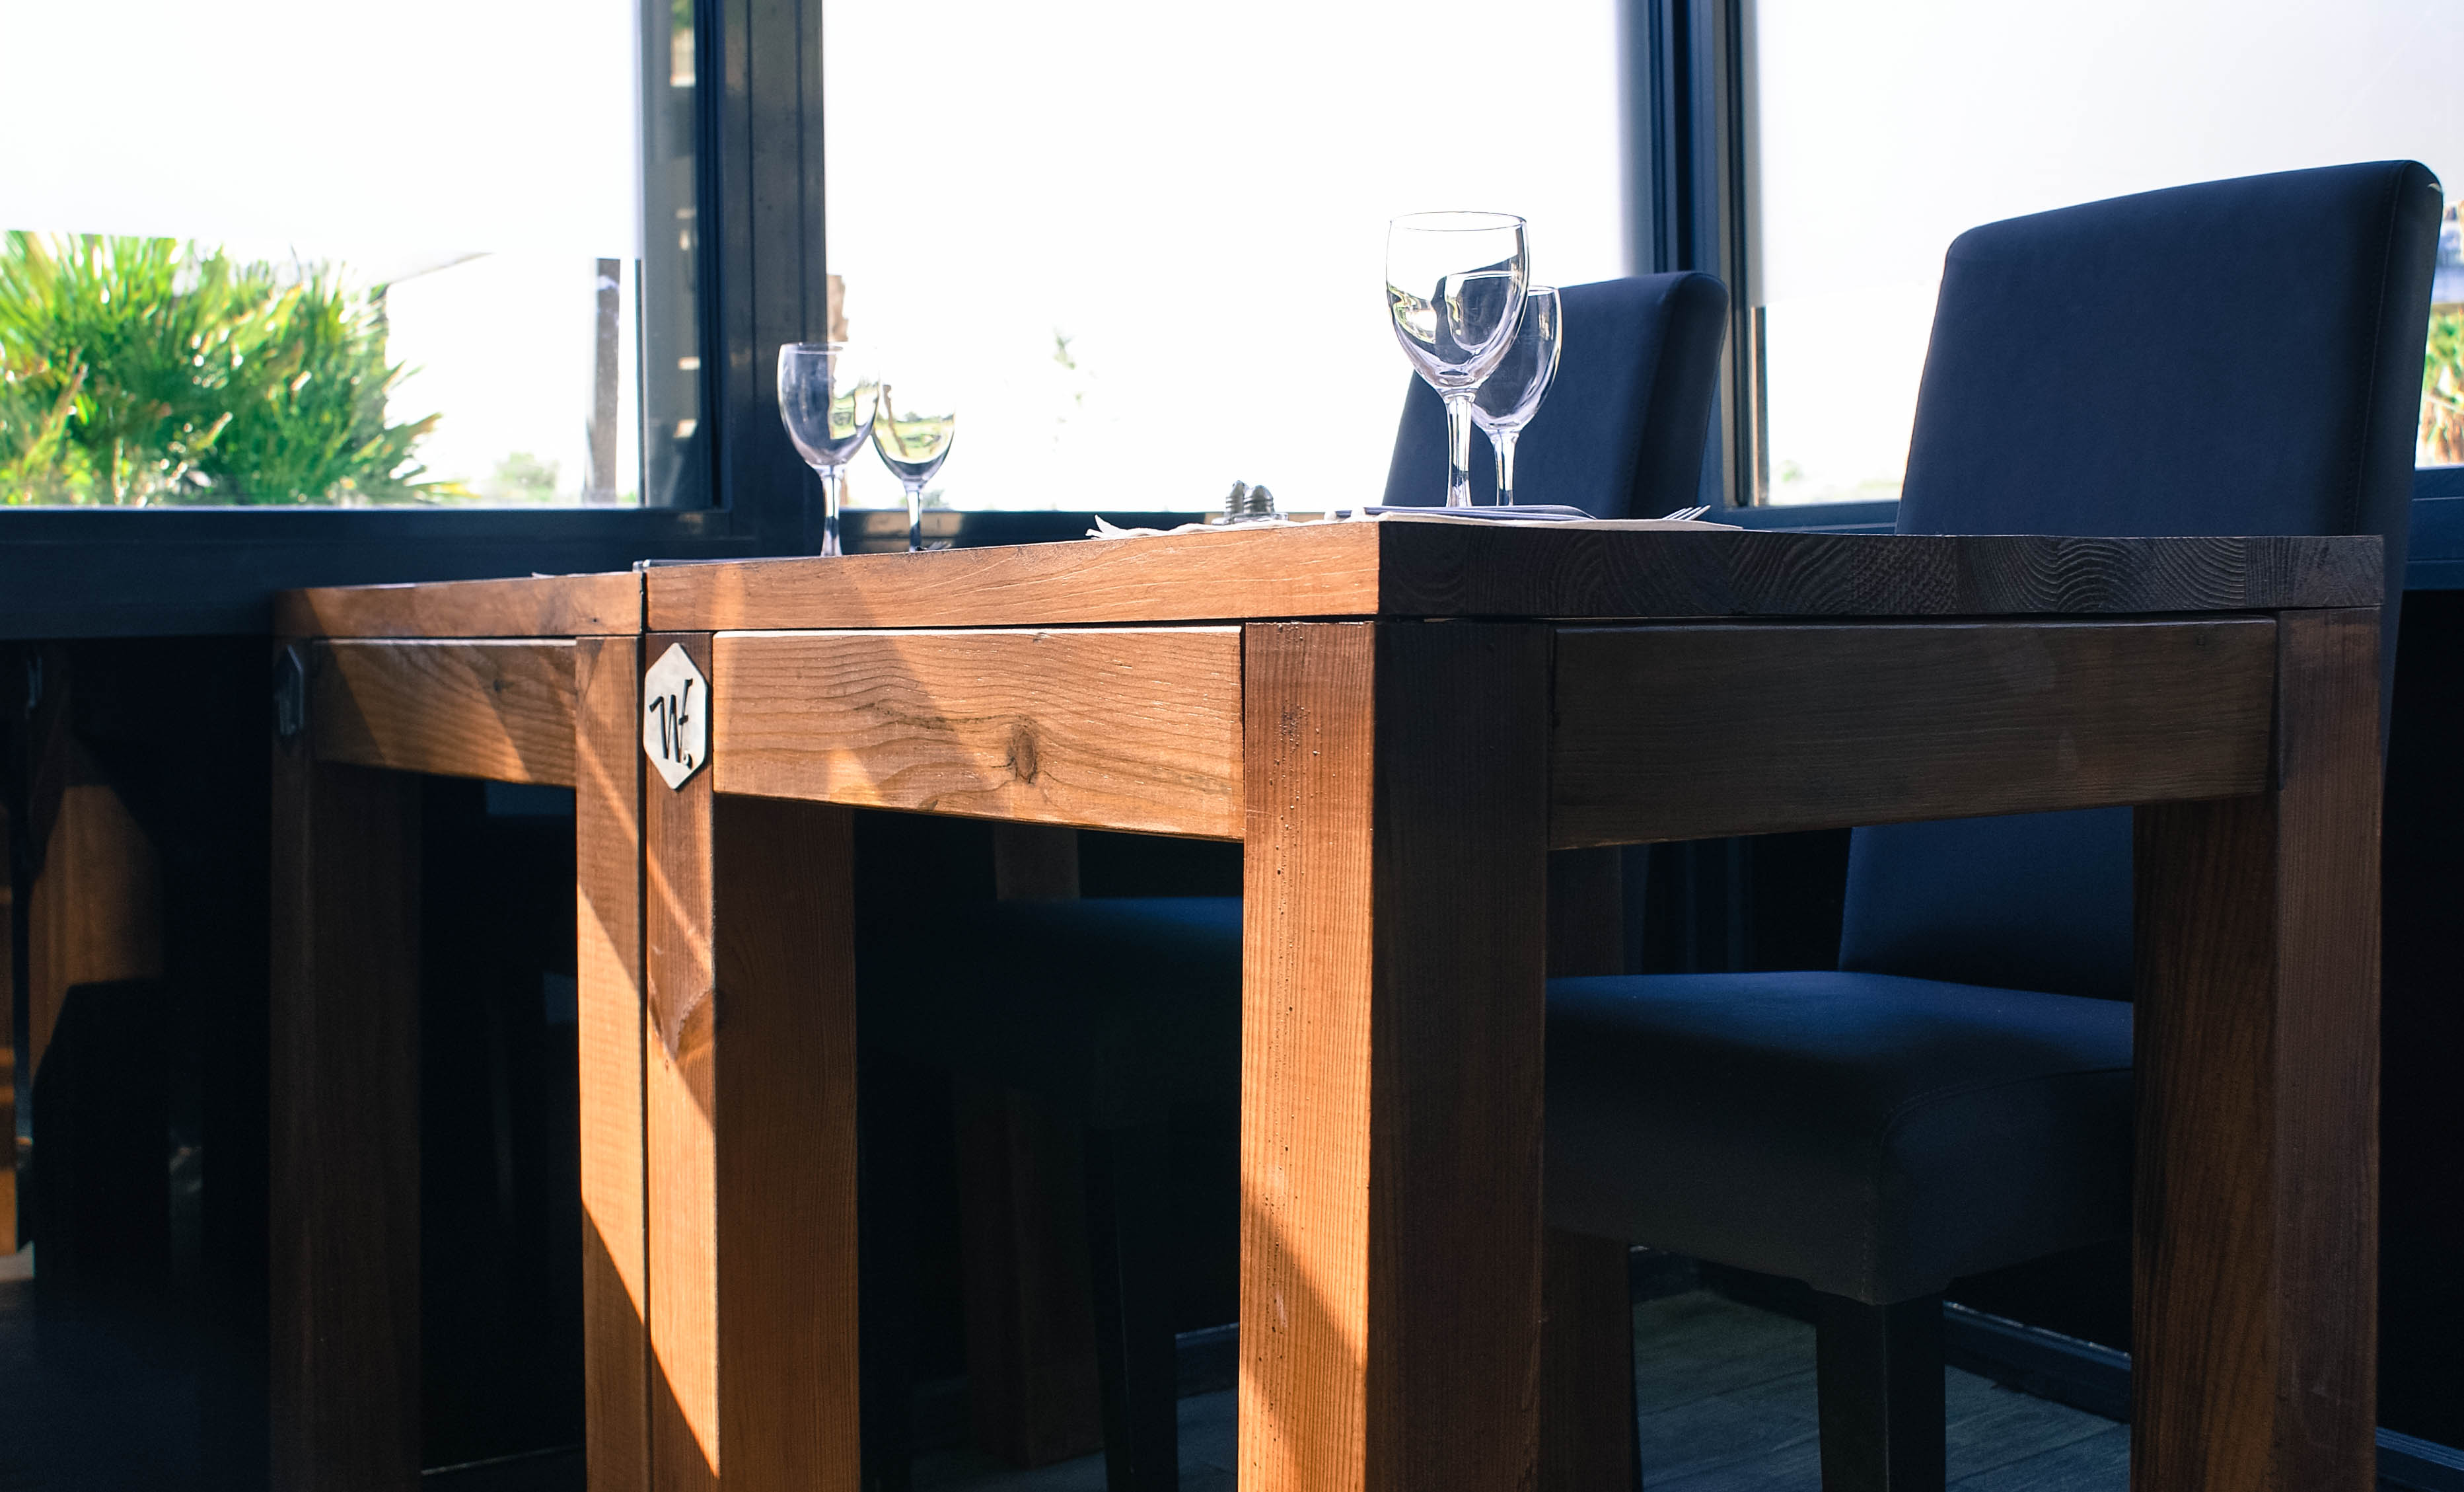 Tables int Le comptoir 9